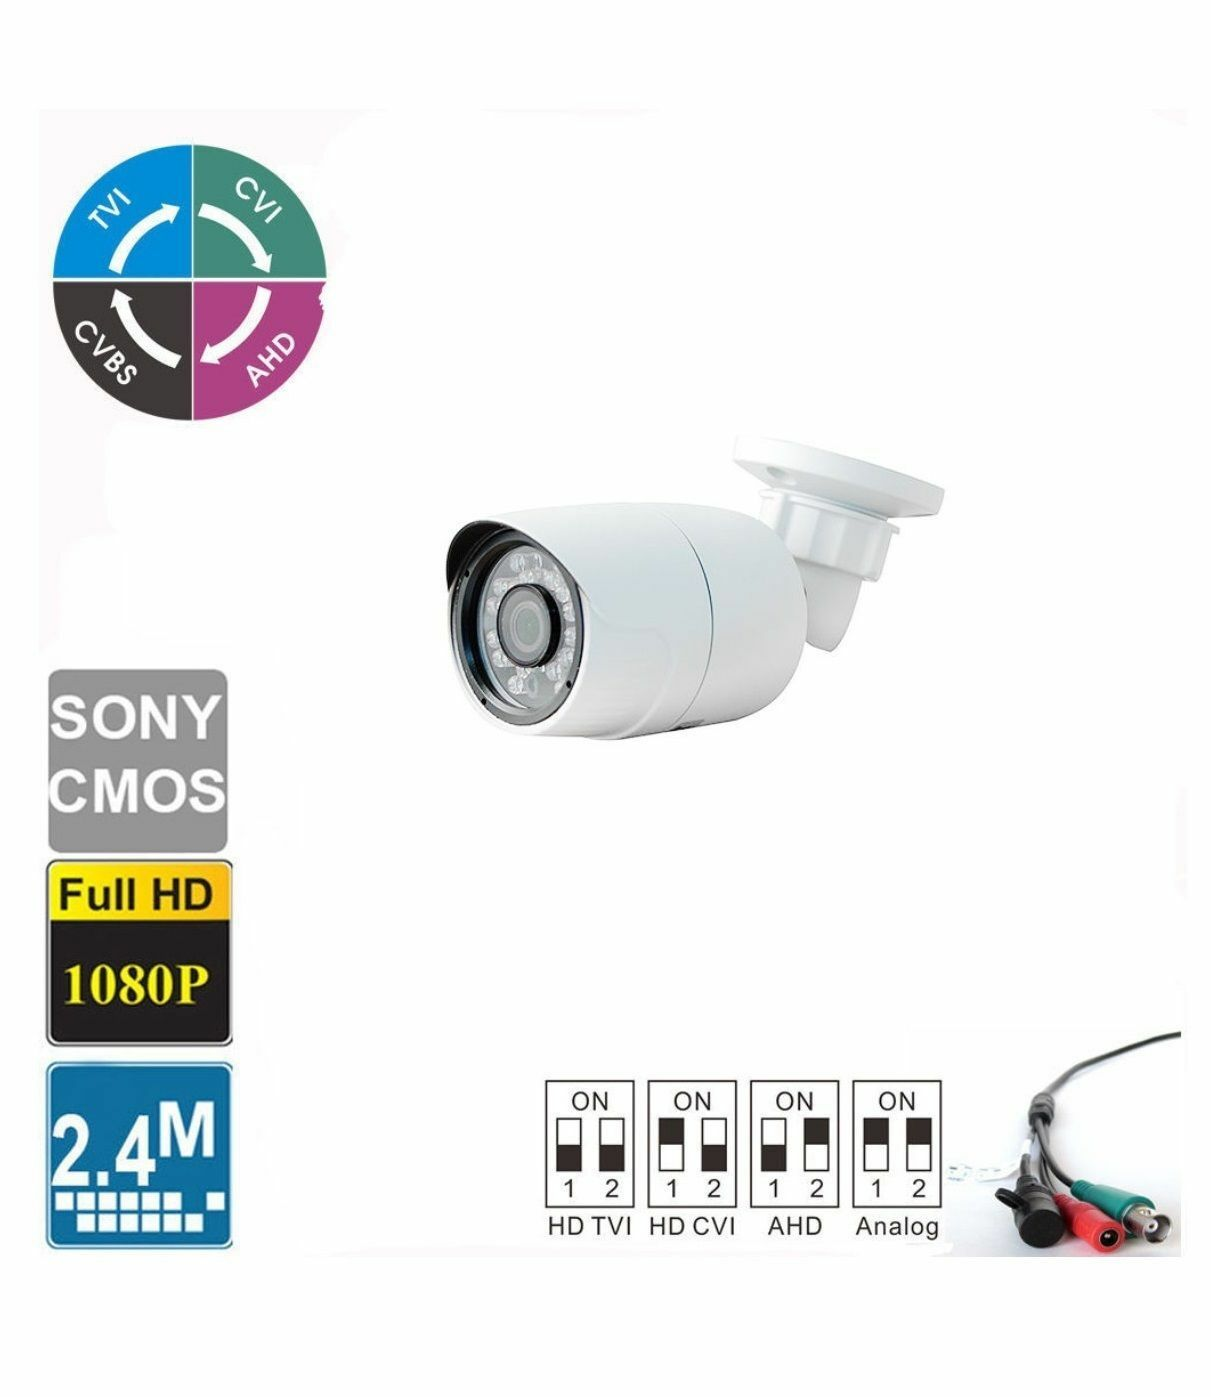 HD-CVI 2.4MP 1080P HD-TVI HD-AHD Analog Dome Camera Sony CMOS 4 IN 1 Camera